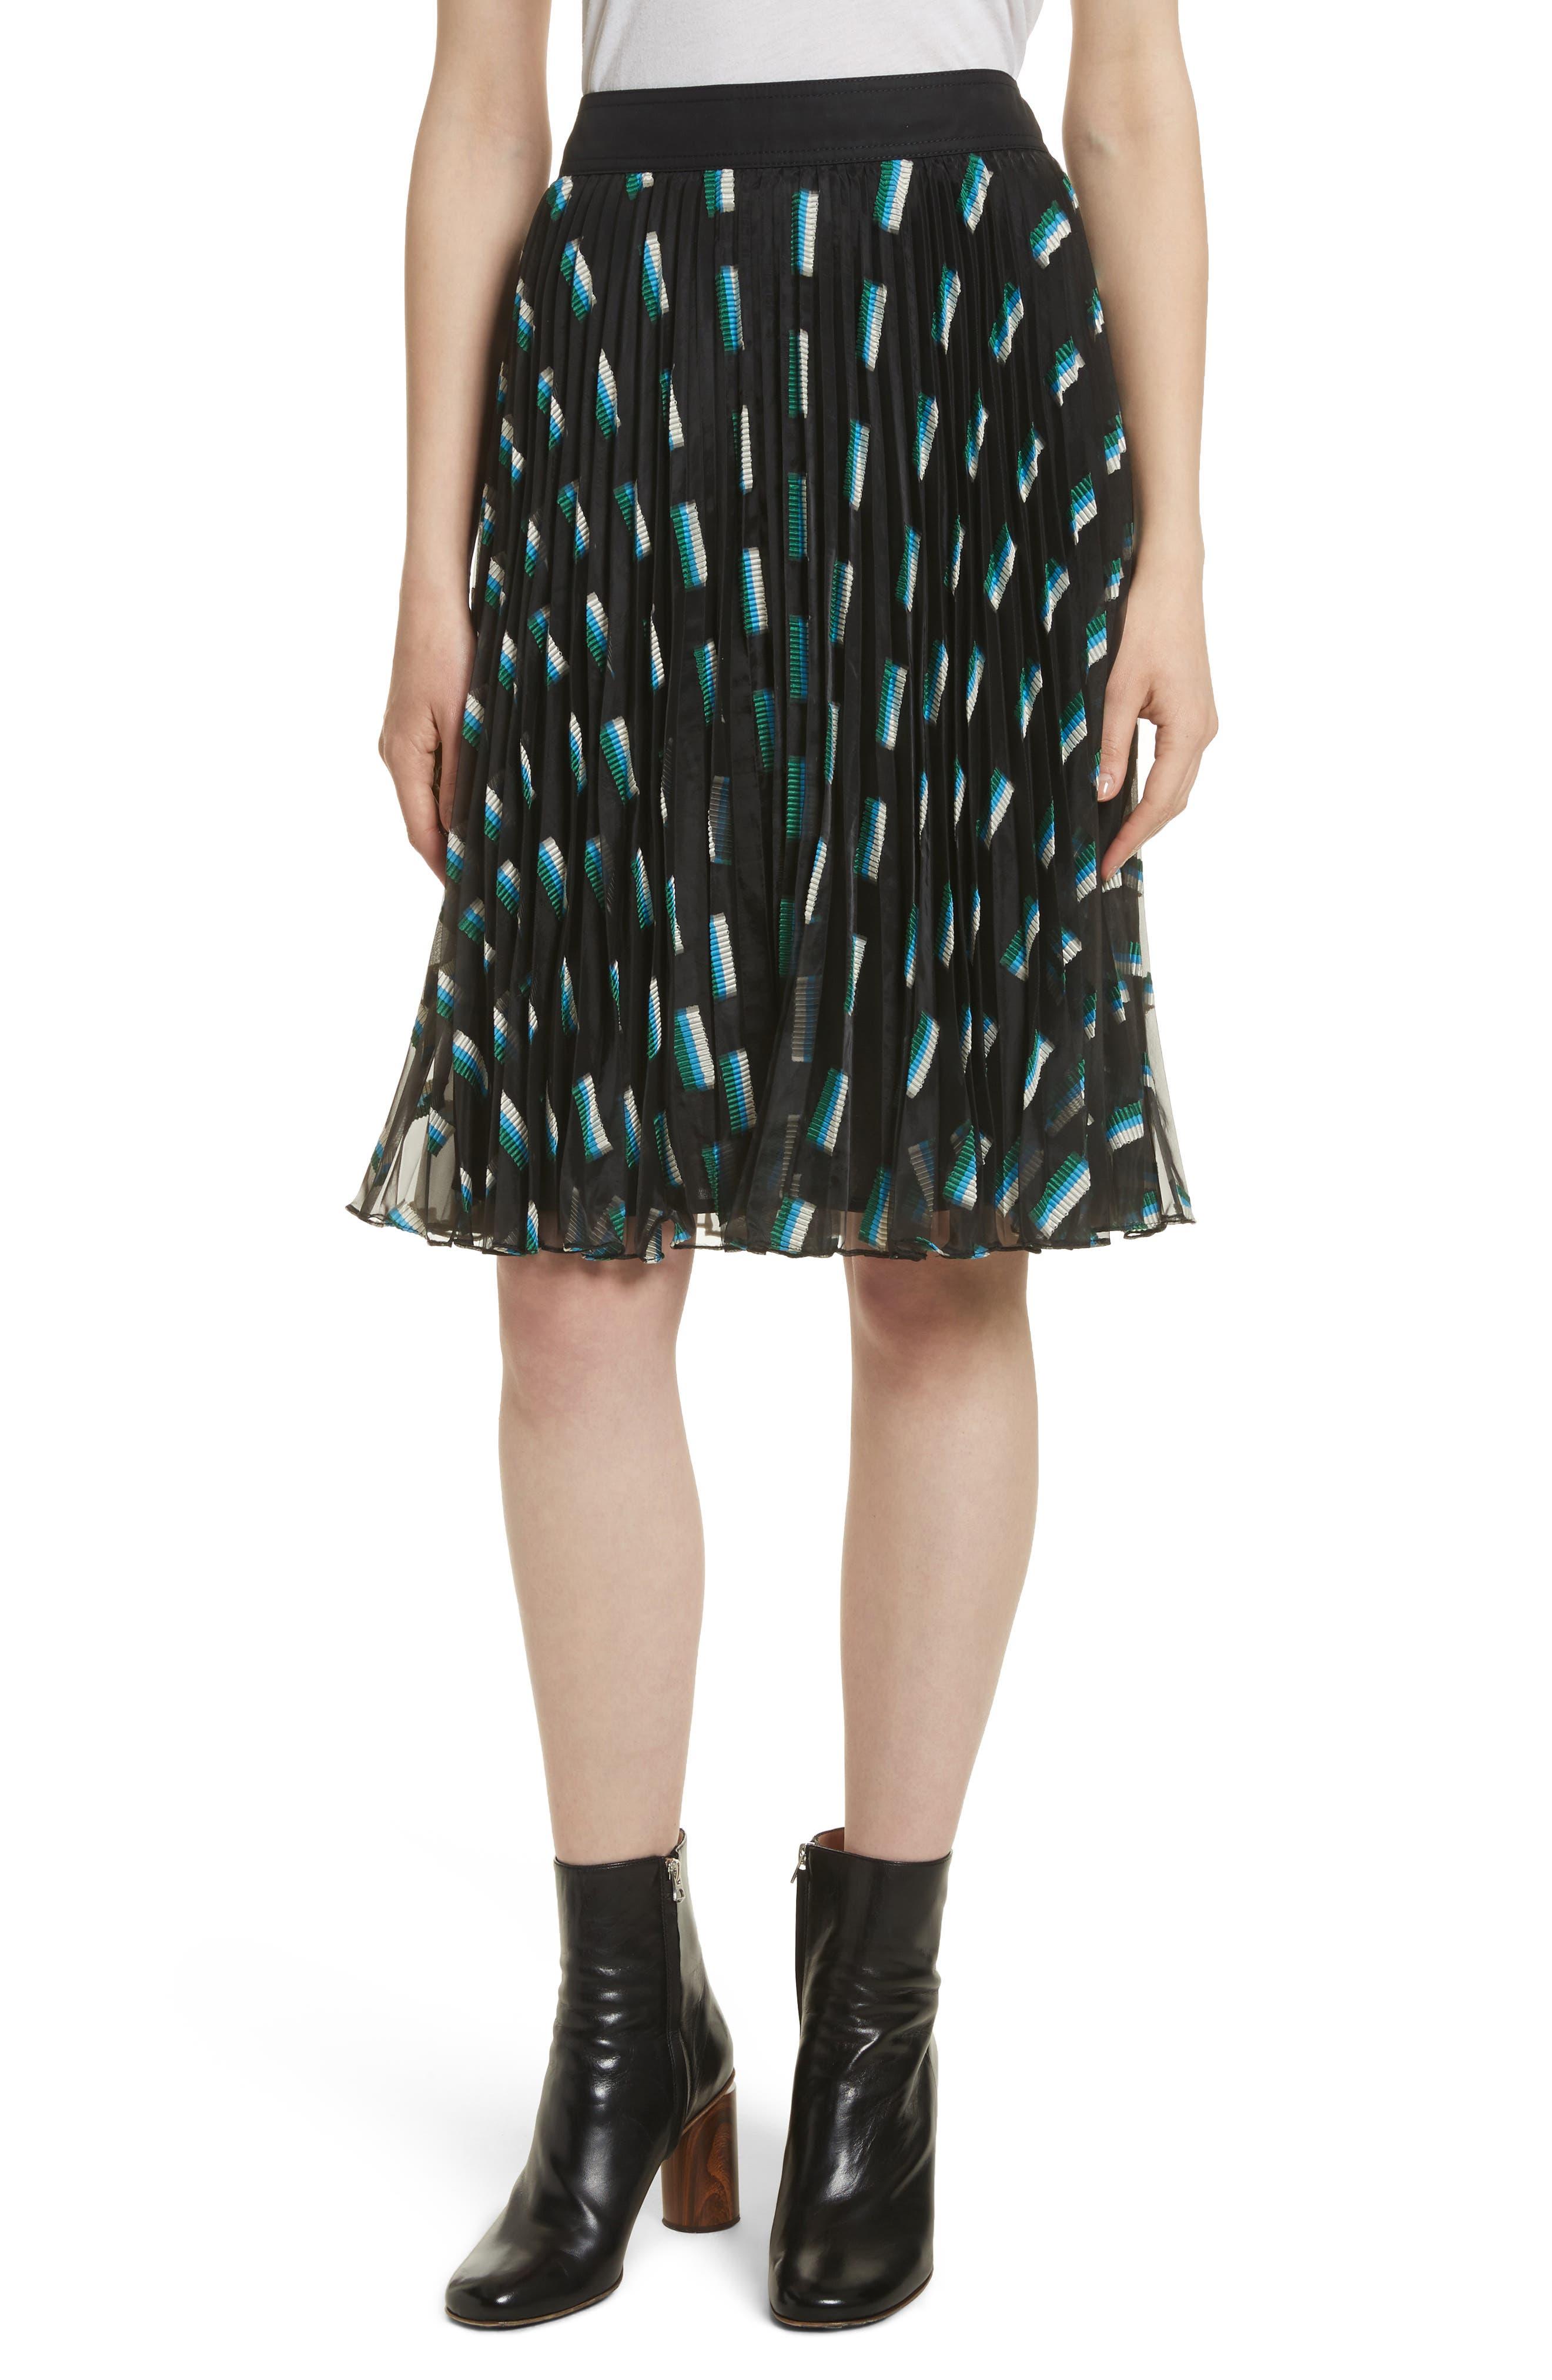 GREY Jason Wu Fil Coupé A-Line Skirt